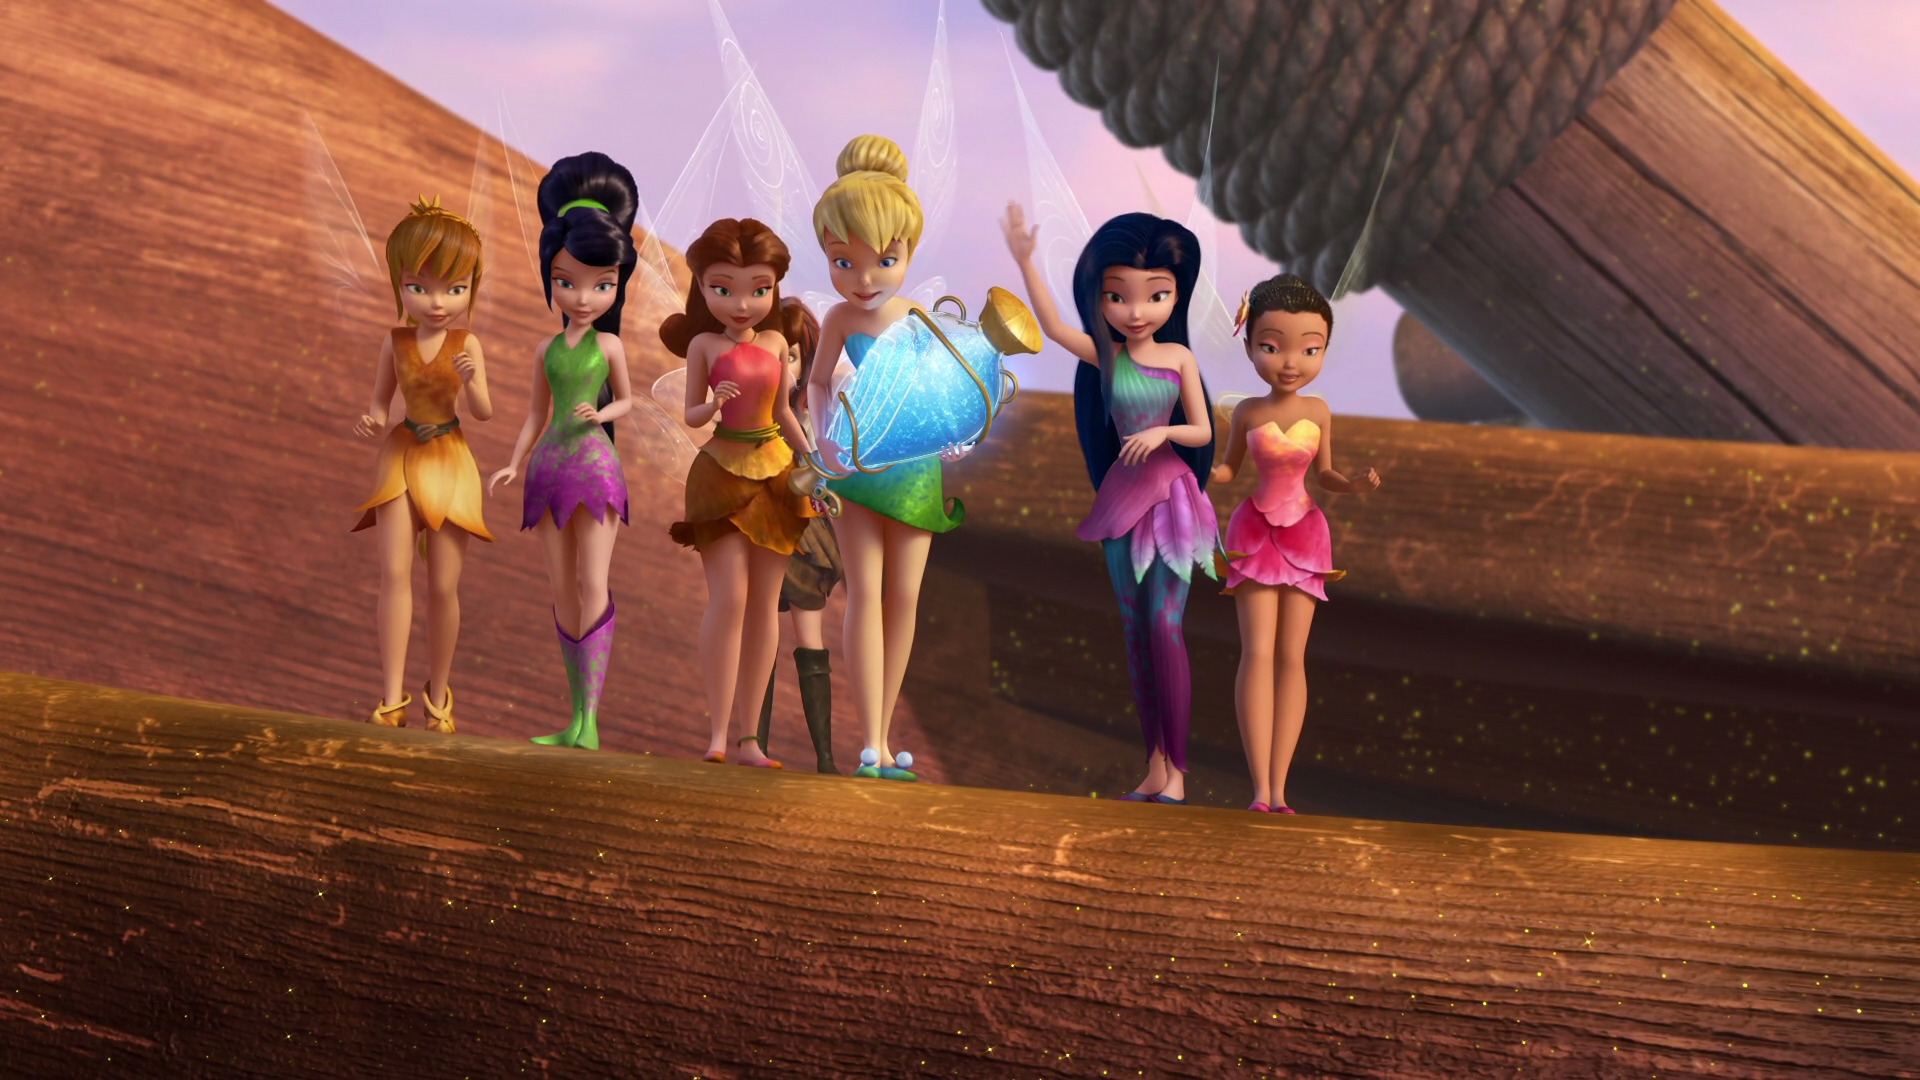 Pirate Fairy Disneyscreencaps 7710